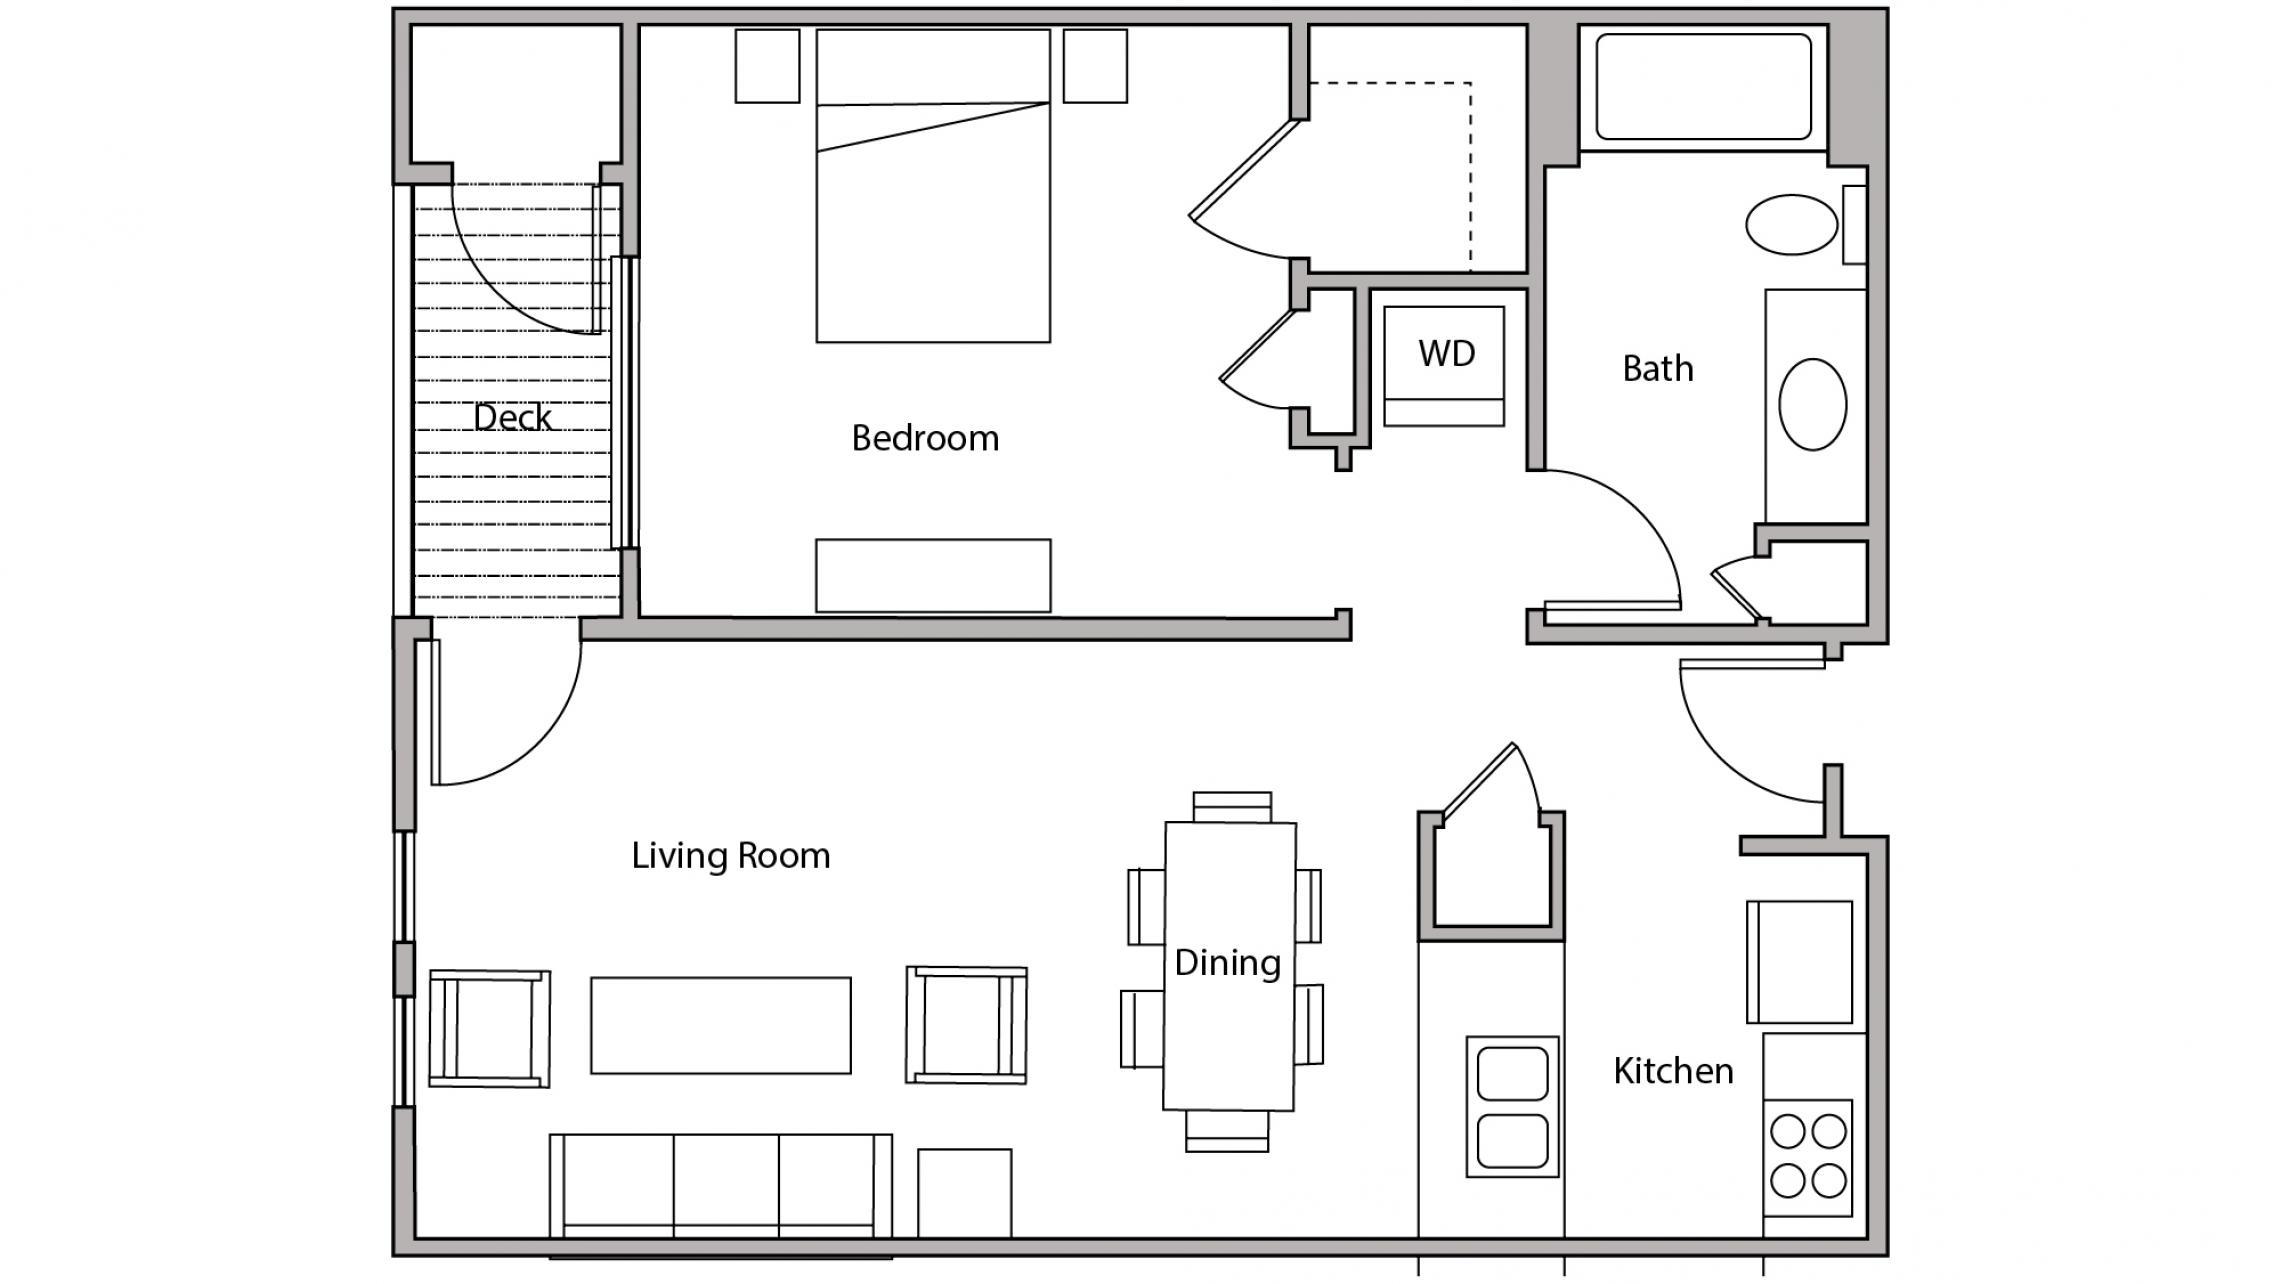 ULI City Place 406 - One Bedroom, One Bathroom